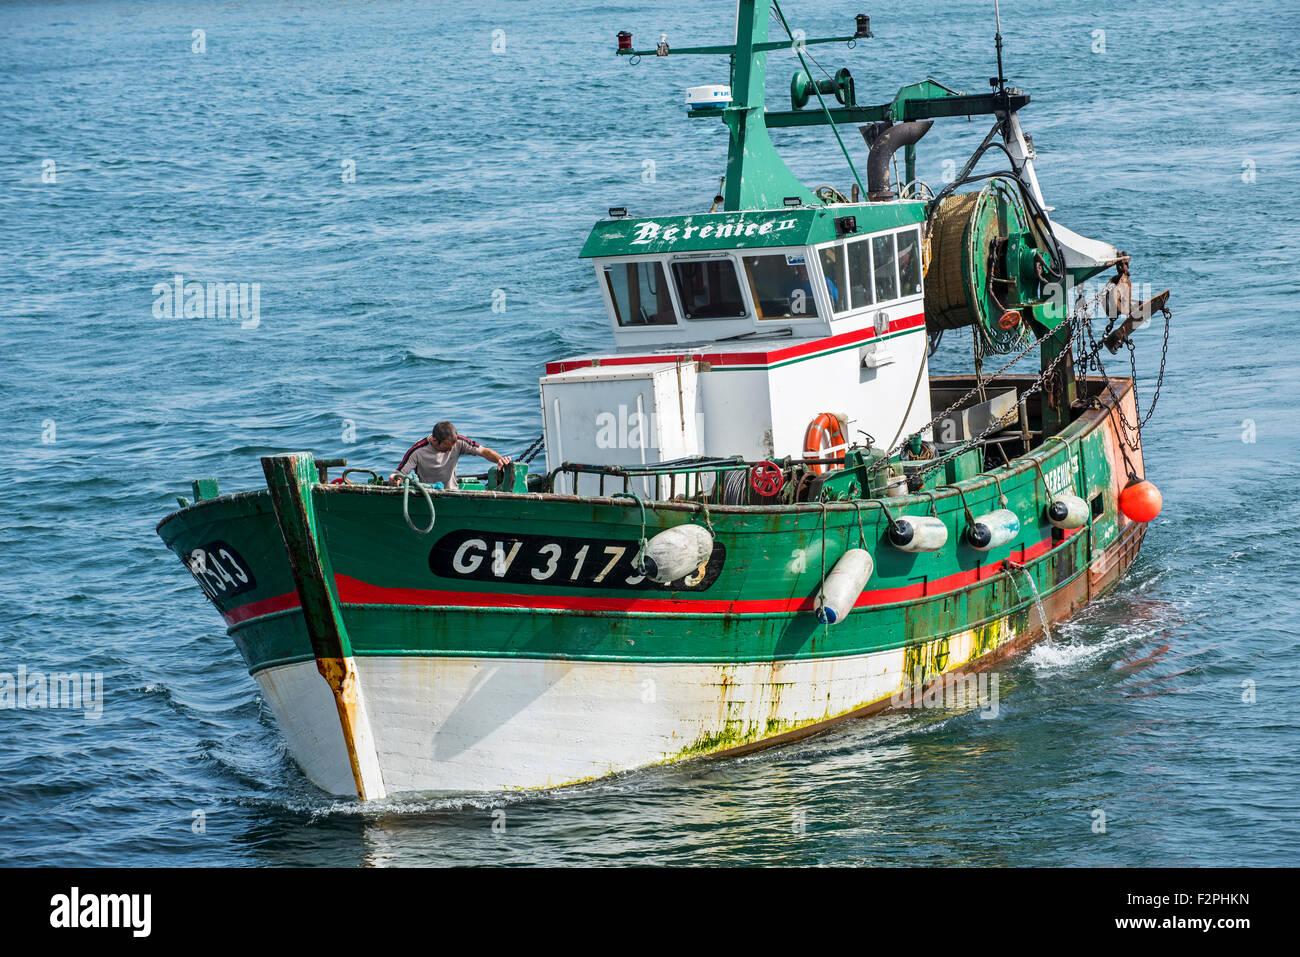 Fisherman on board of green wooden trawler fishing boat at sea Stock Photo: 87777977 - Alamy